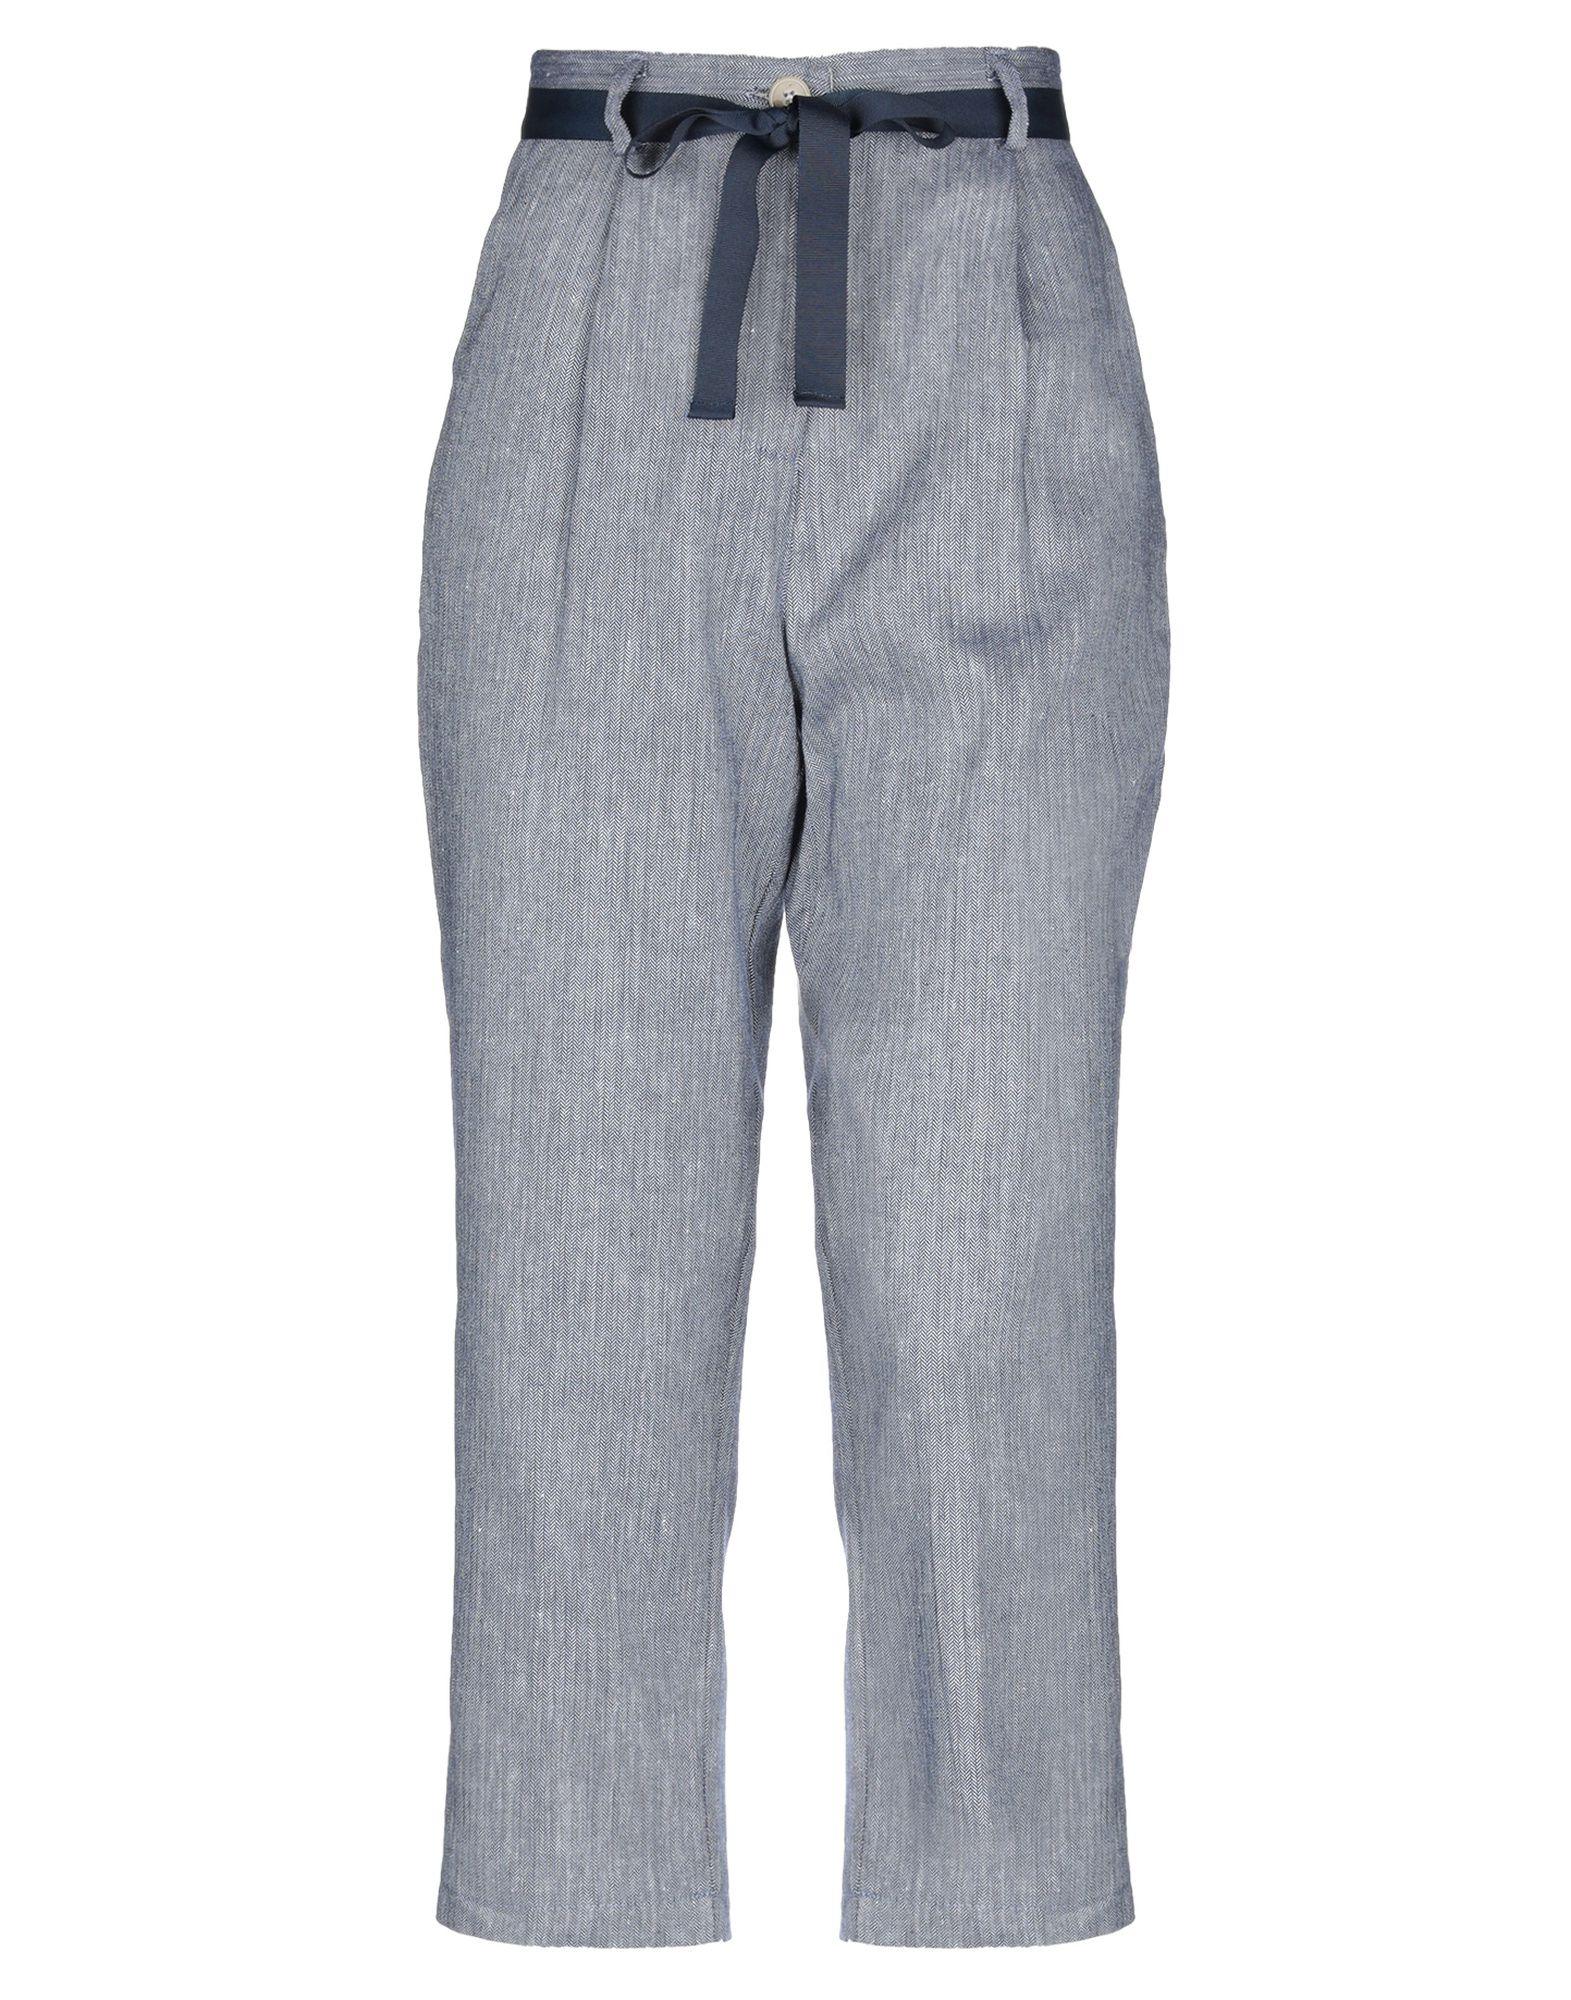 JANE BLANC Paris Повседневные брюки jane blanc paris свитер